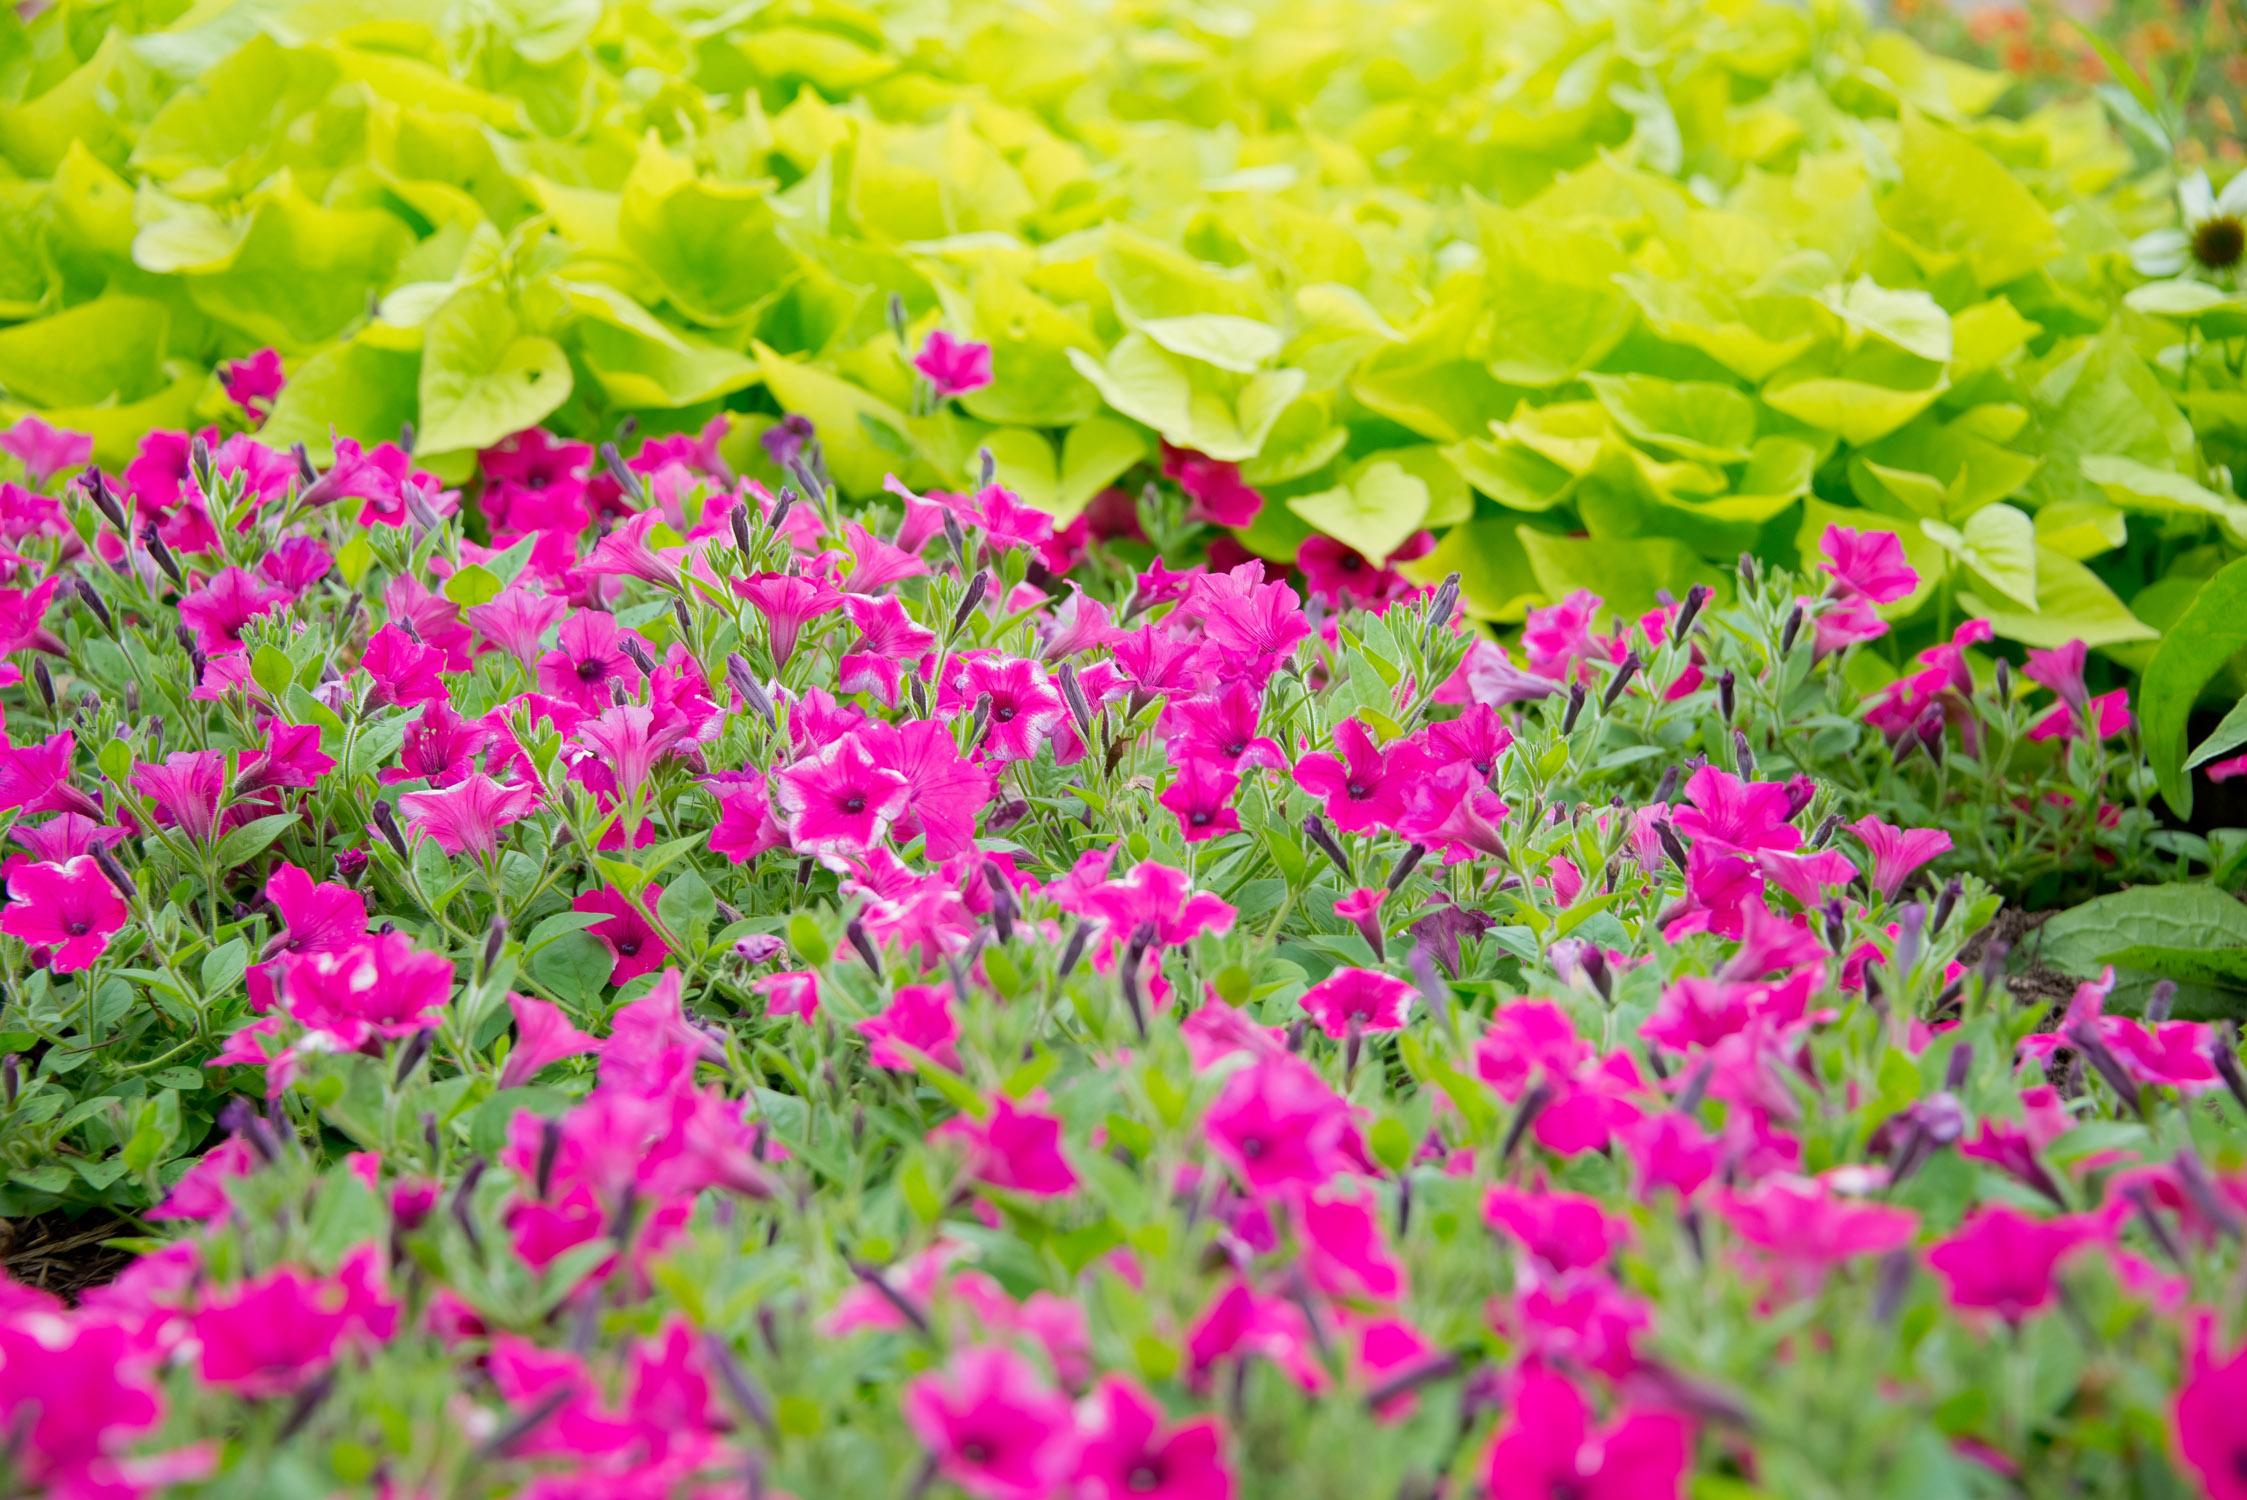 GardenEvent_Photos_Tiffany_012.jpg